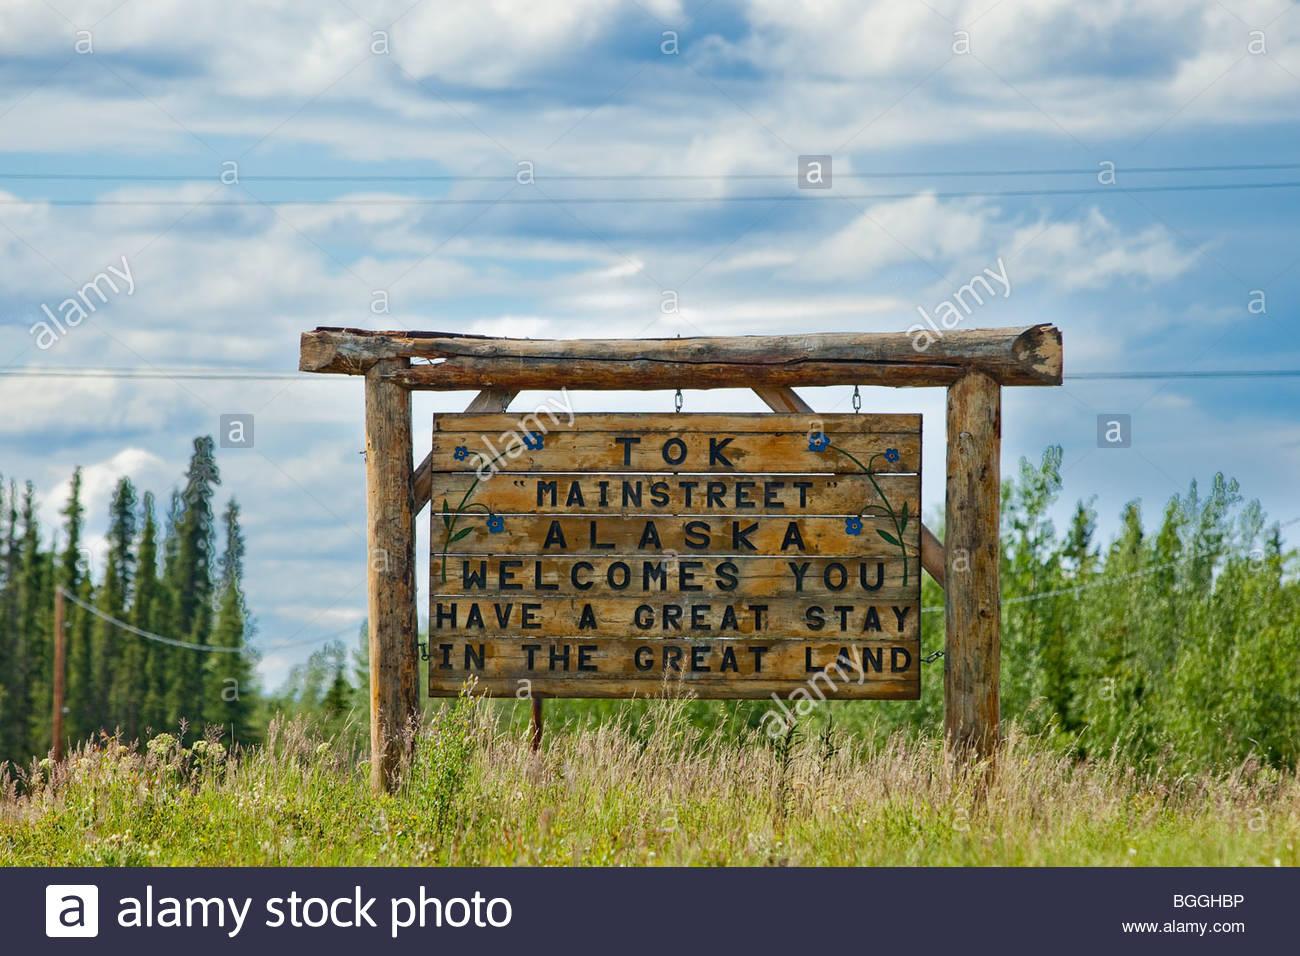 Alaska, Tok. Bienvenue à Tok signe. L'été. Photo Stock